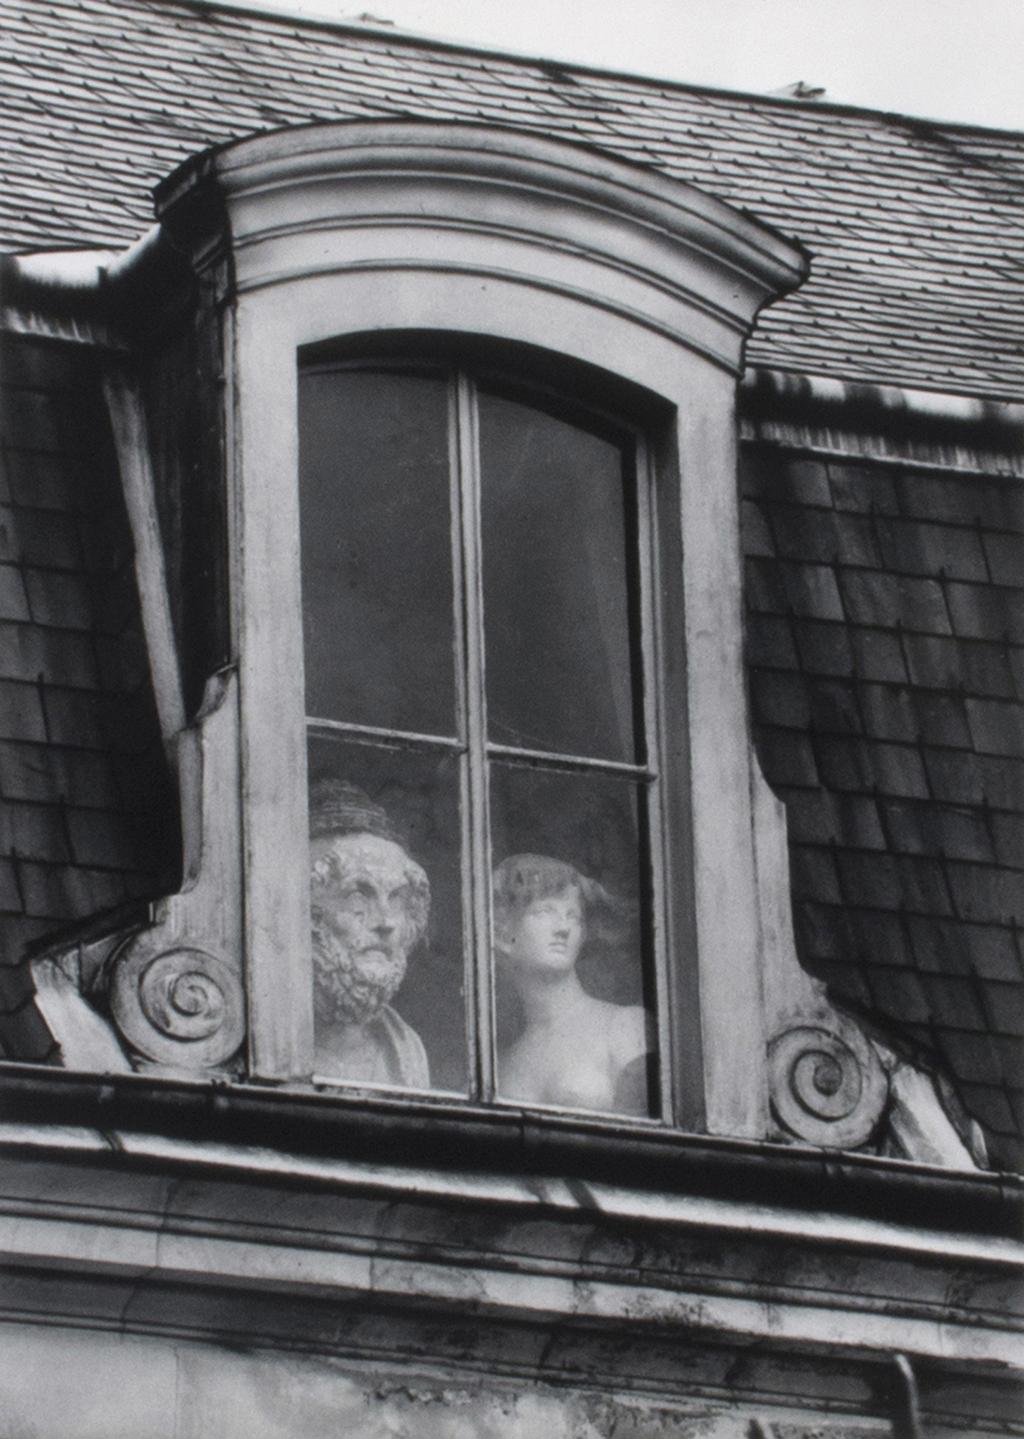 La finestra di fronte una mostra di andr kert sz - Una finestra di fronte ...